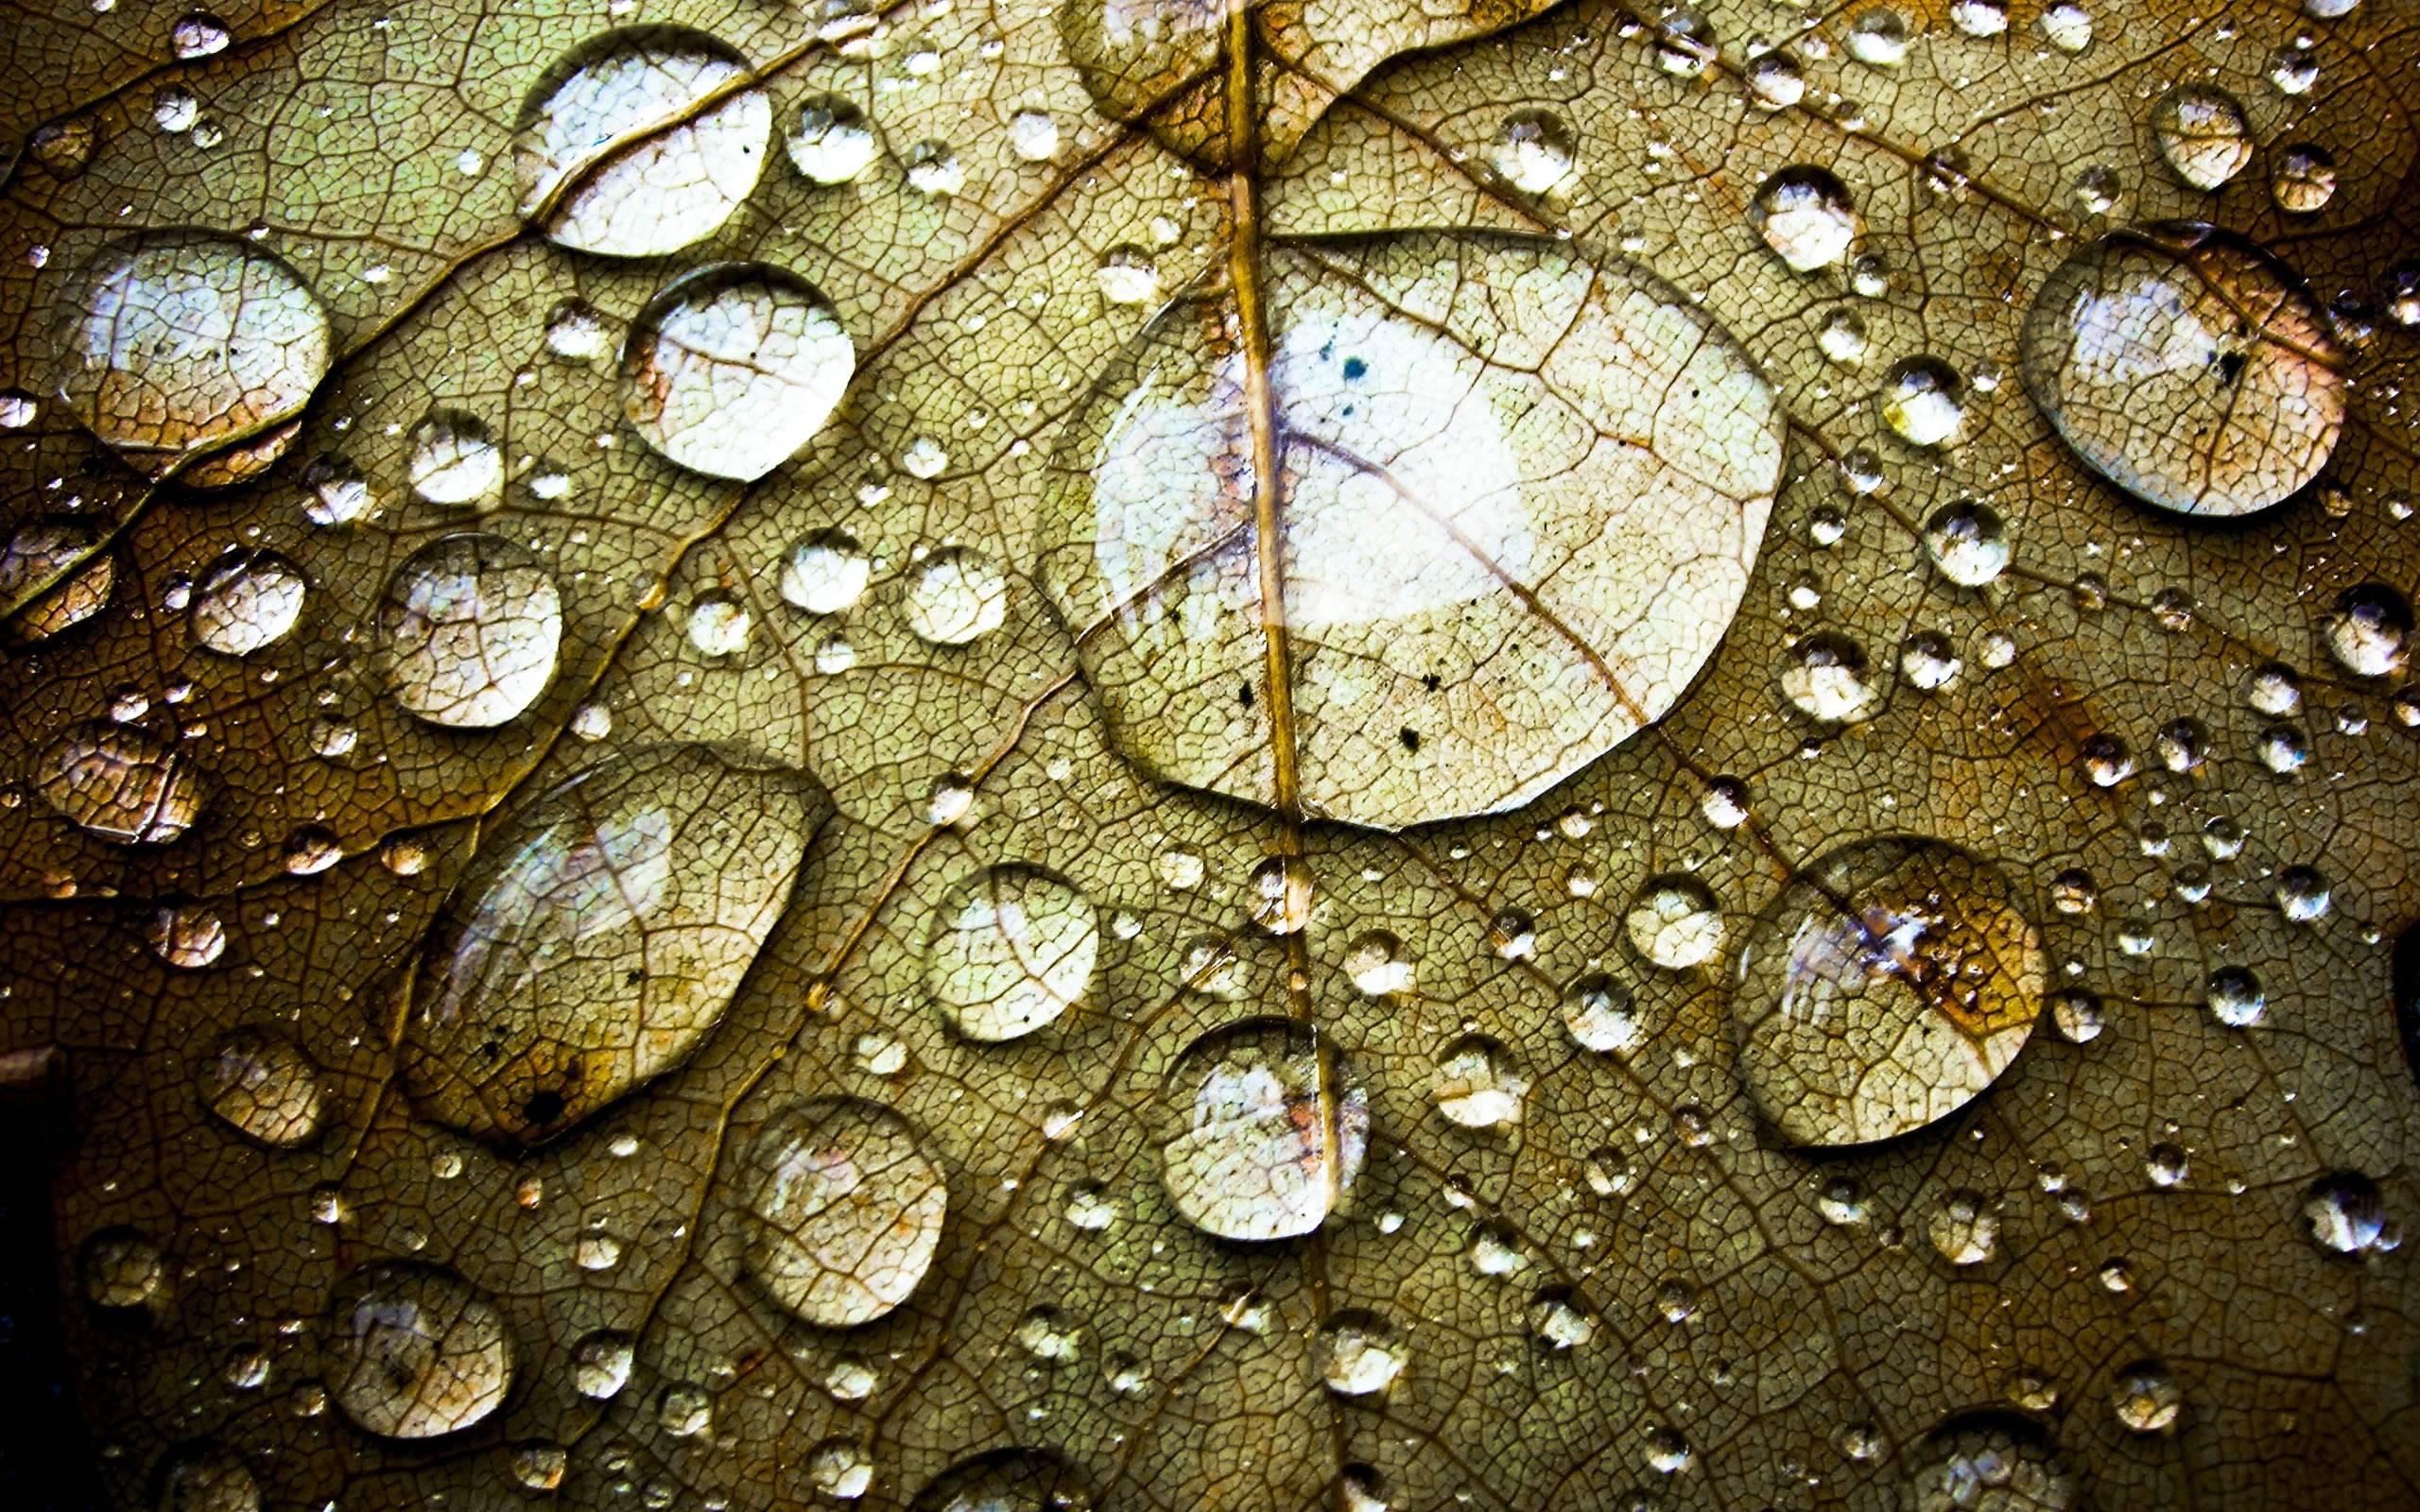 Water Drop Hd Wallpapers  Wallpaper Cave